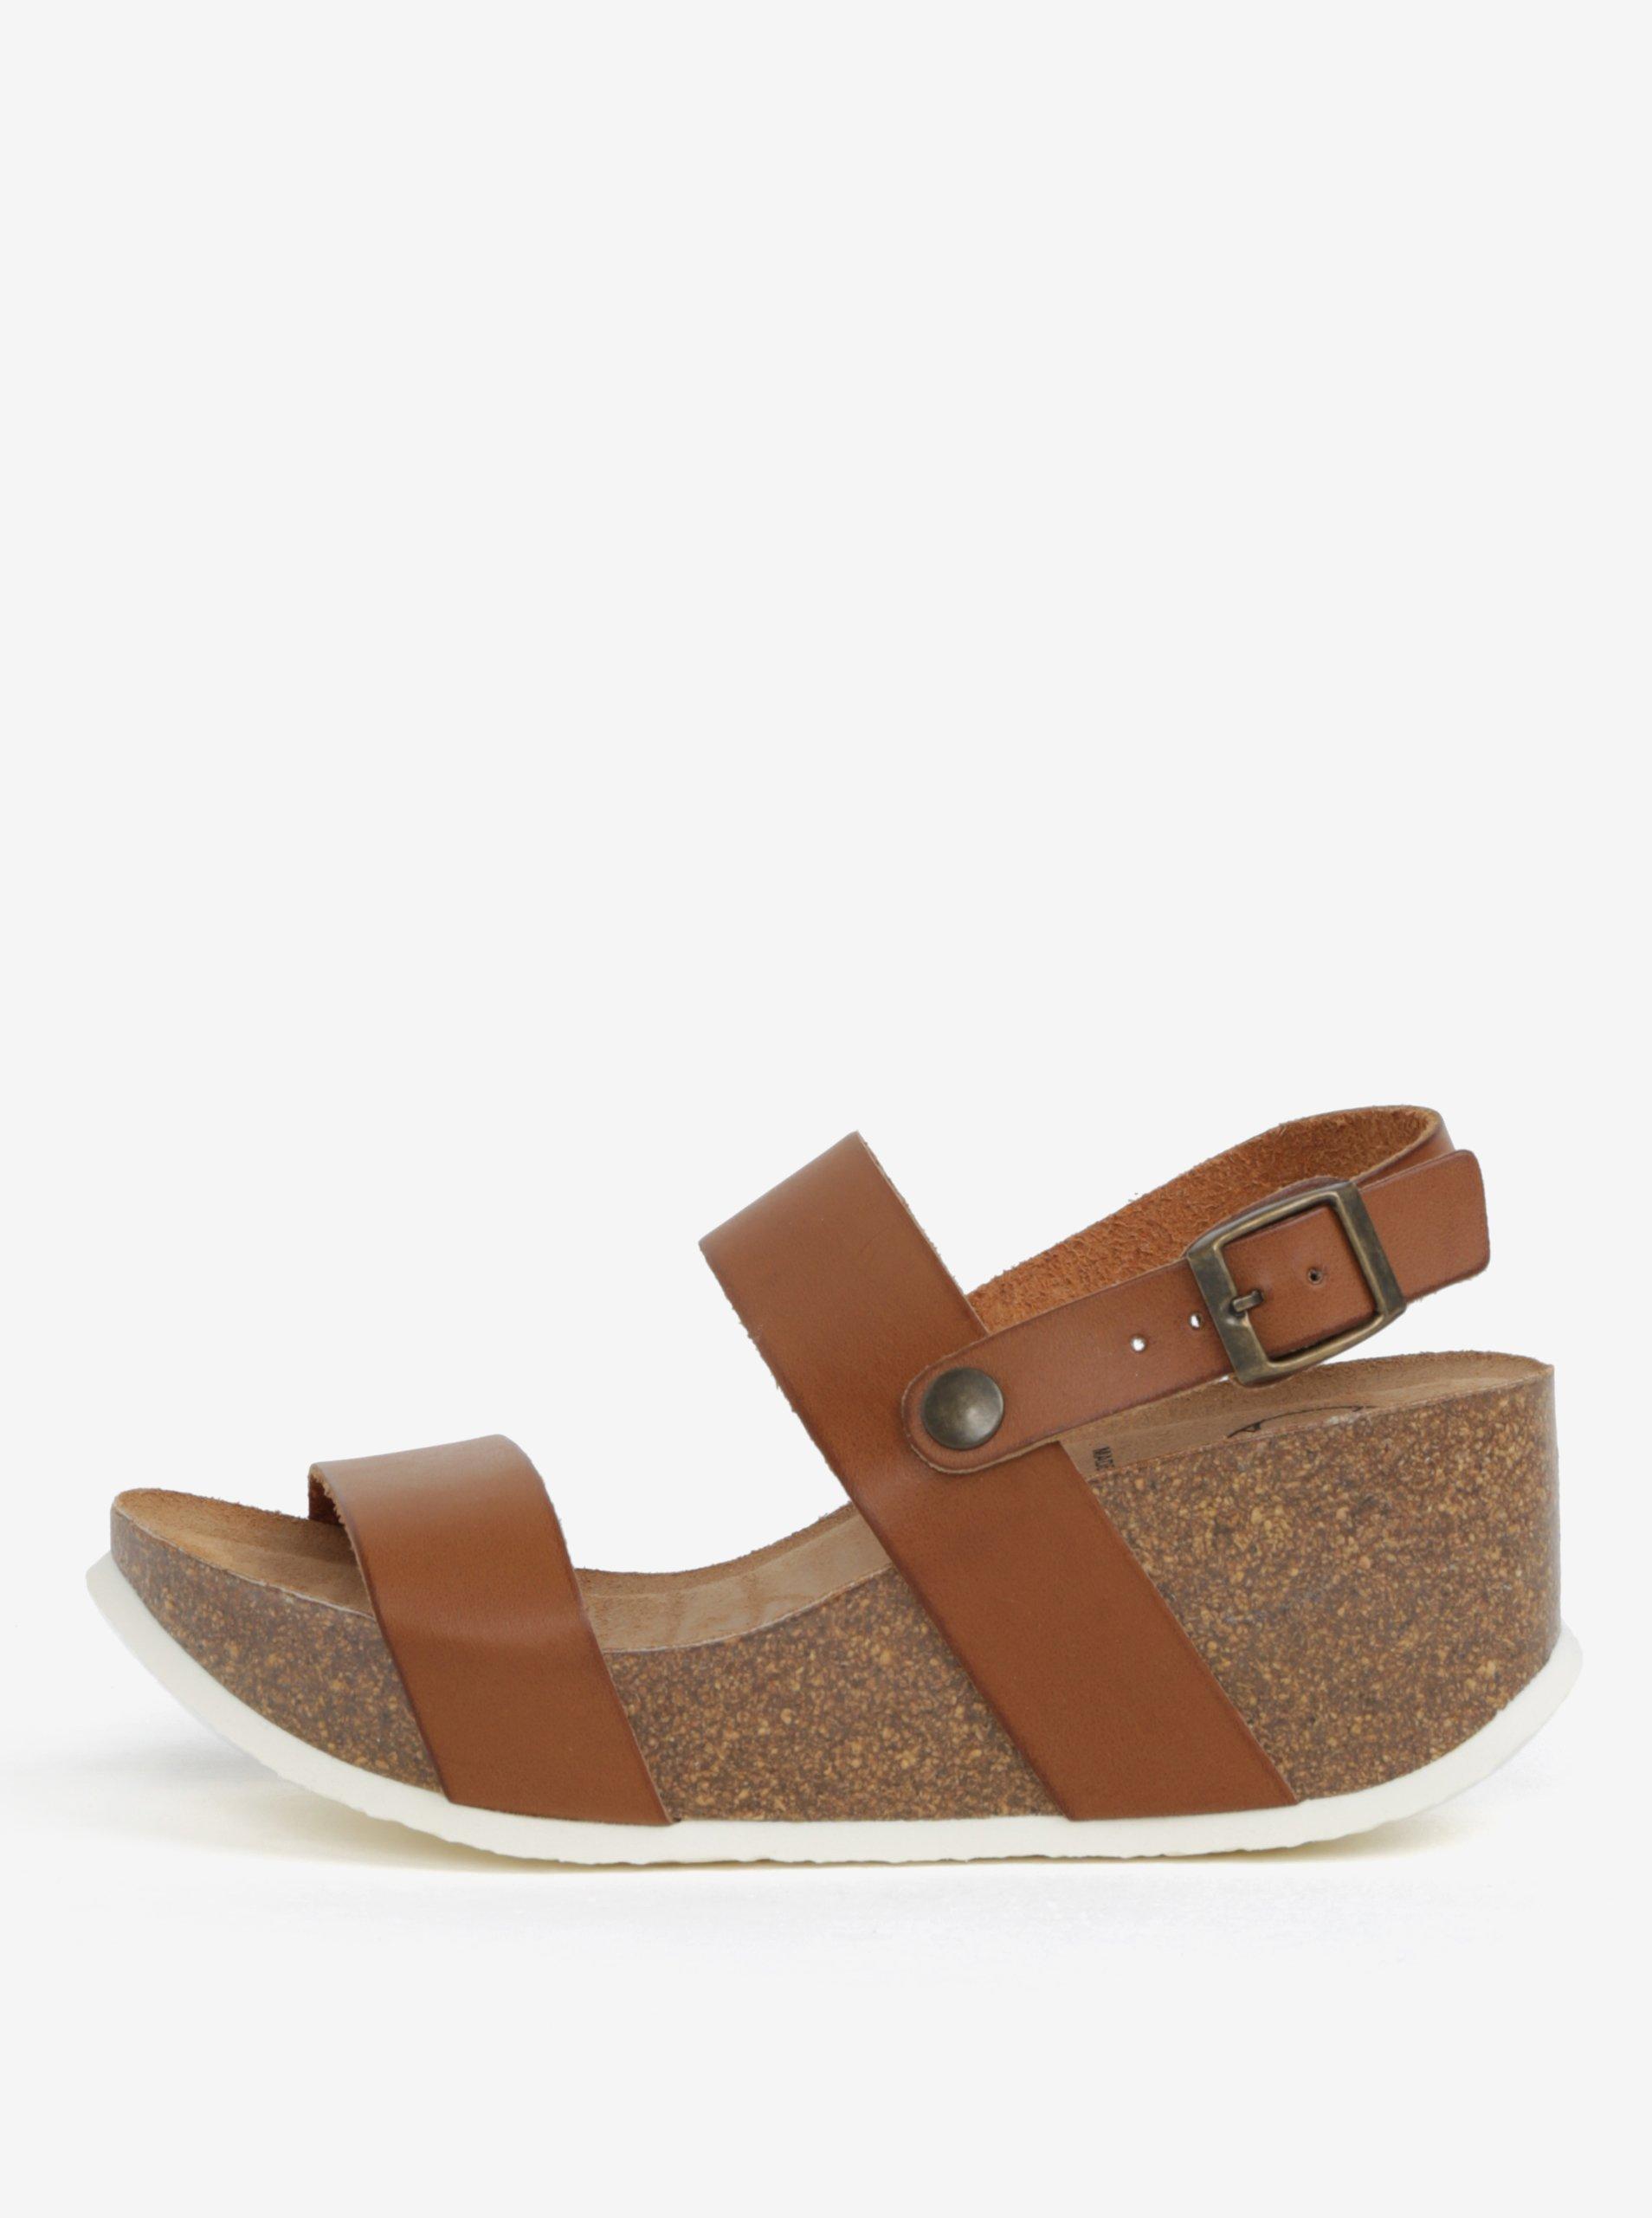 39b4bacbb79de Hnedé sandále na platforme OJJU   Moda.sk